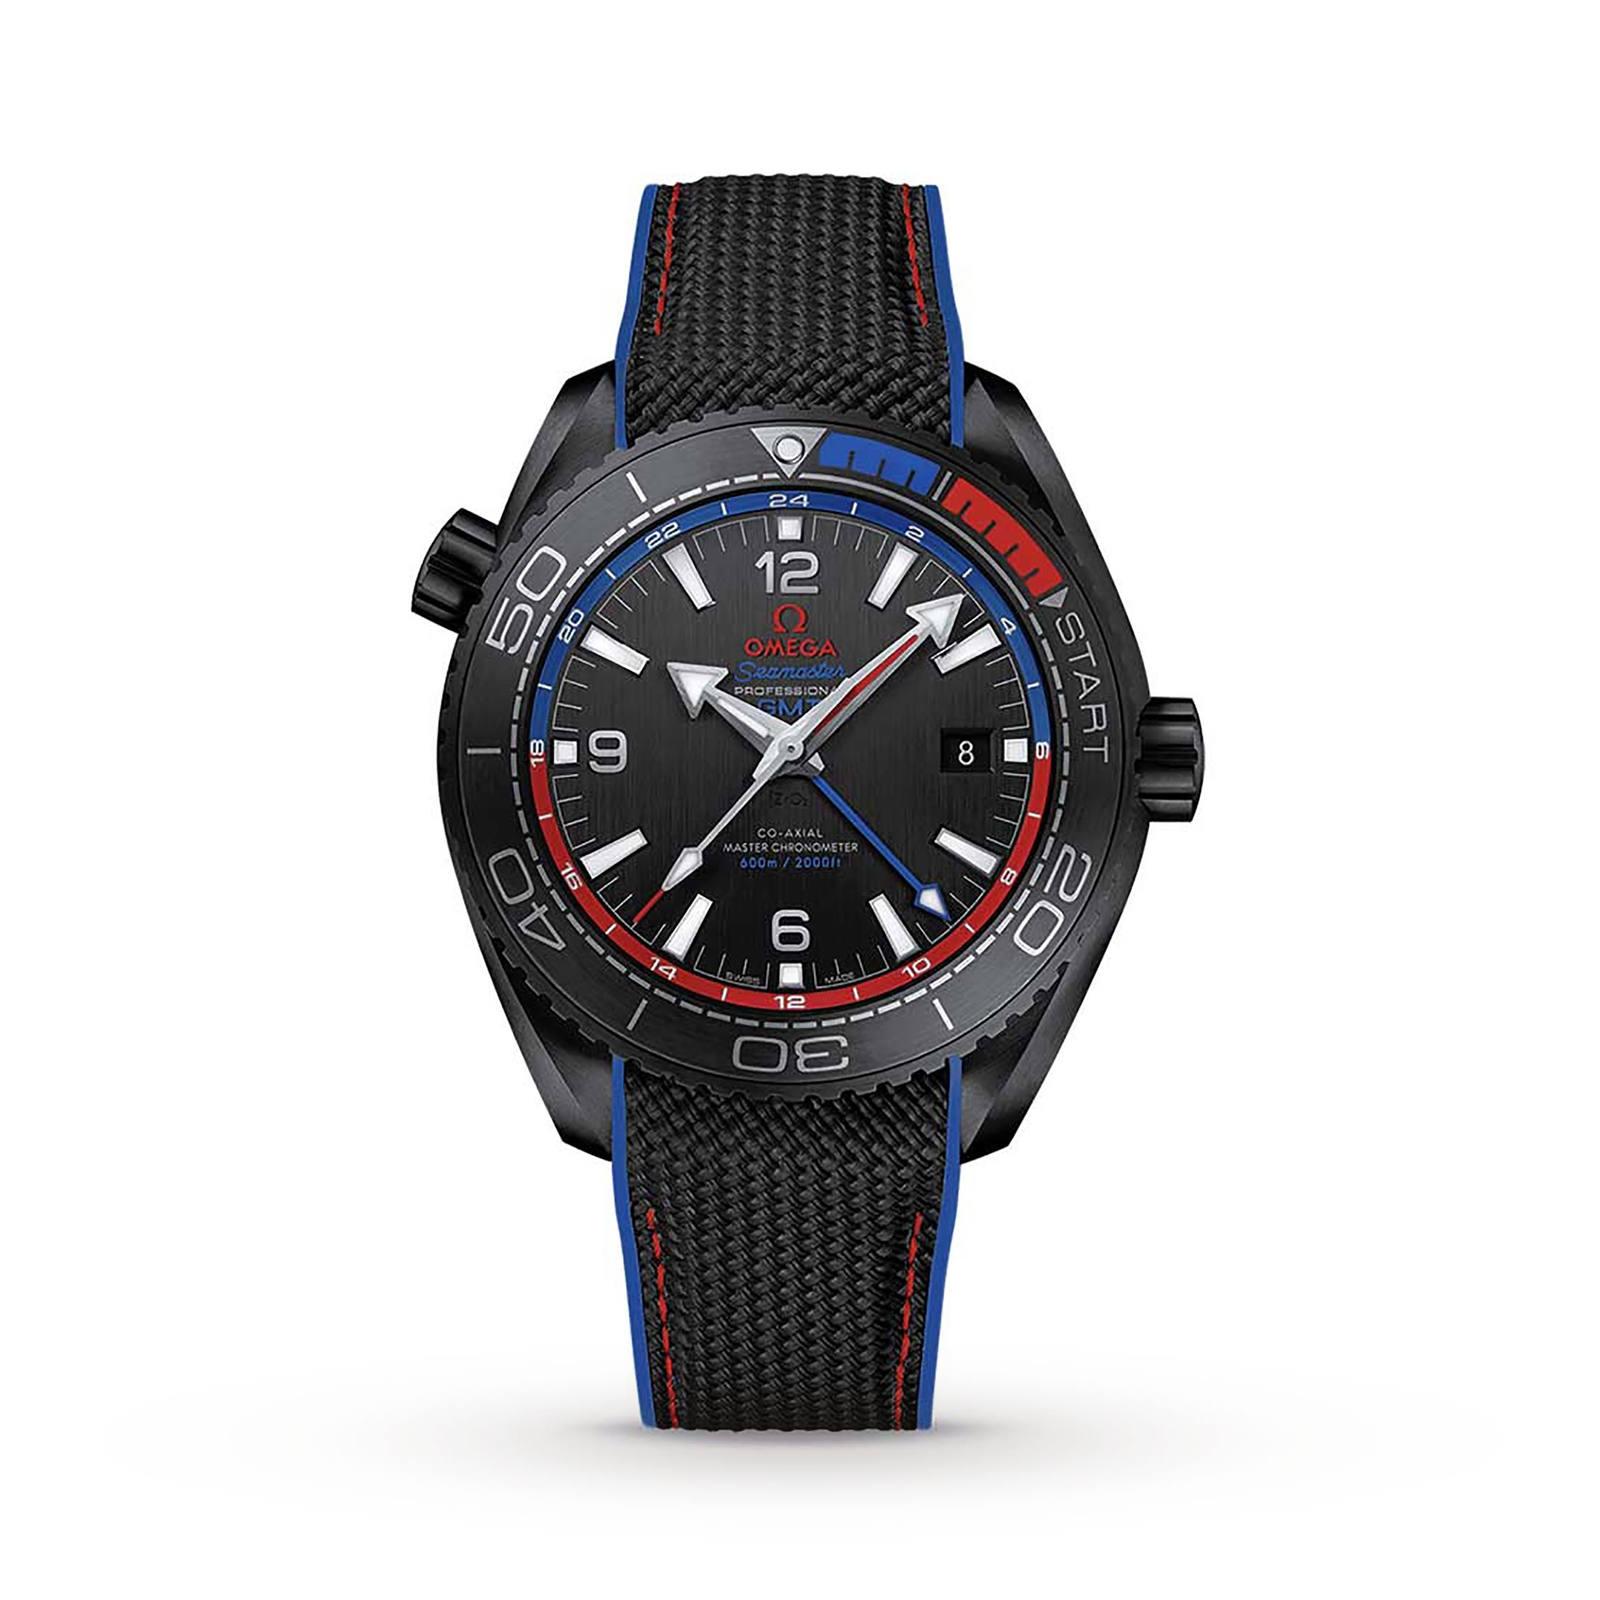 Omega Seamaster Planet Ocean Mens Watch £5,949 at Goldsmith